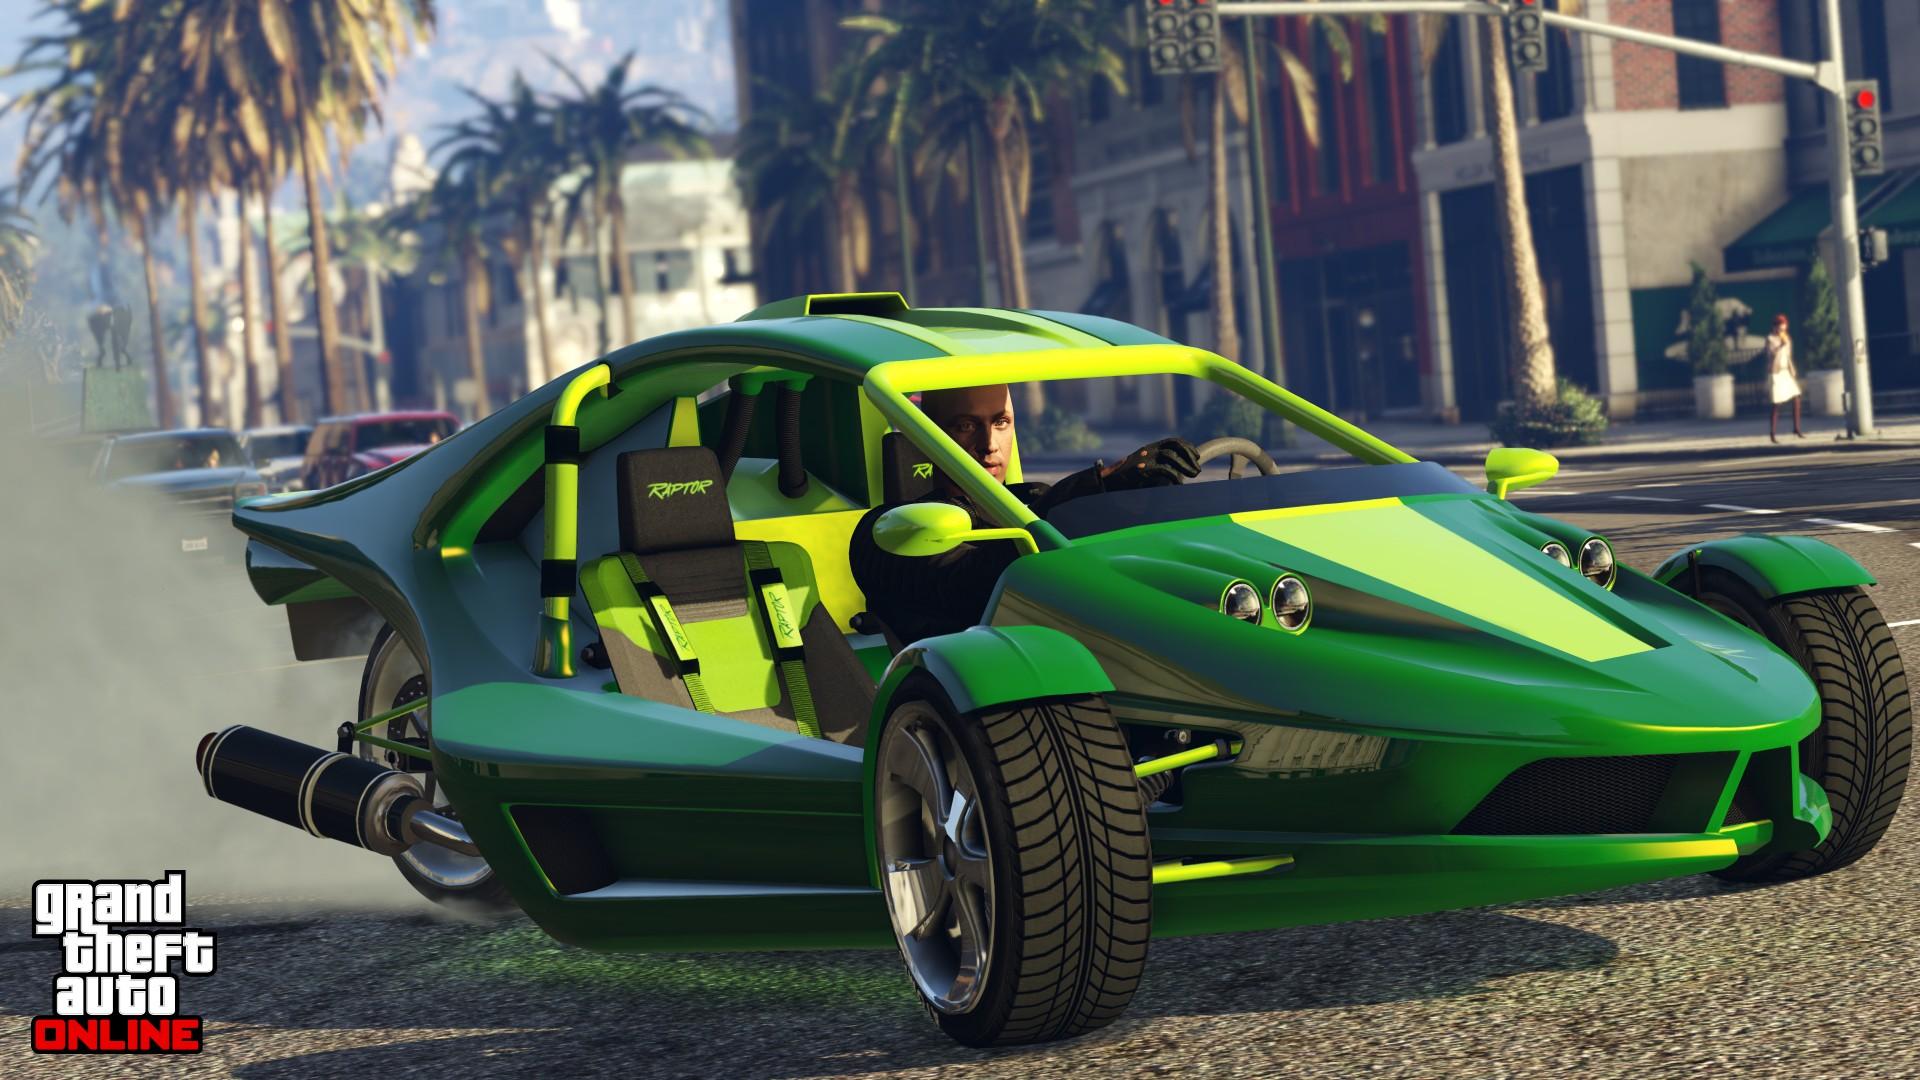 Player driving Raptor in GTA Online